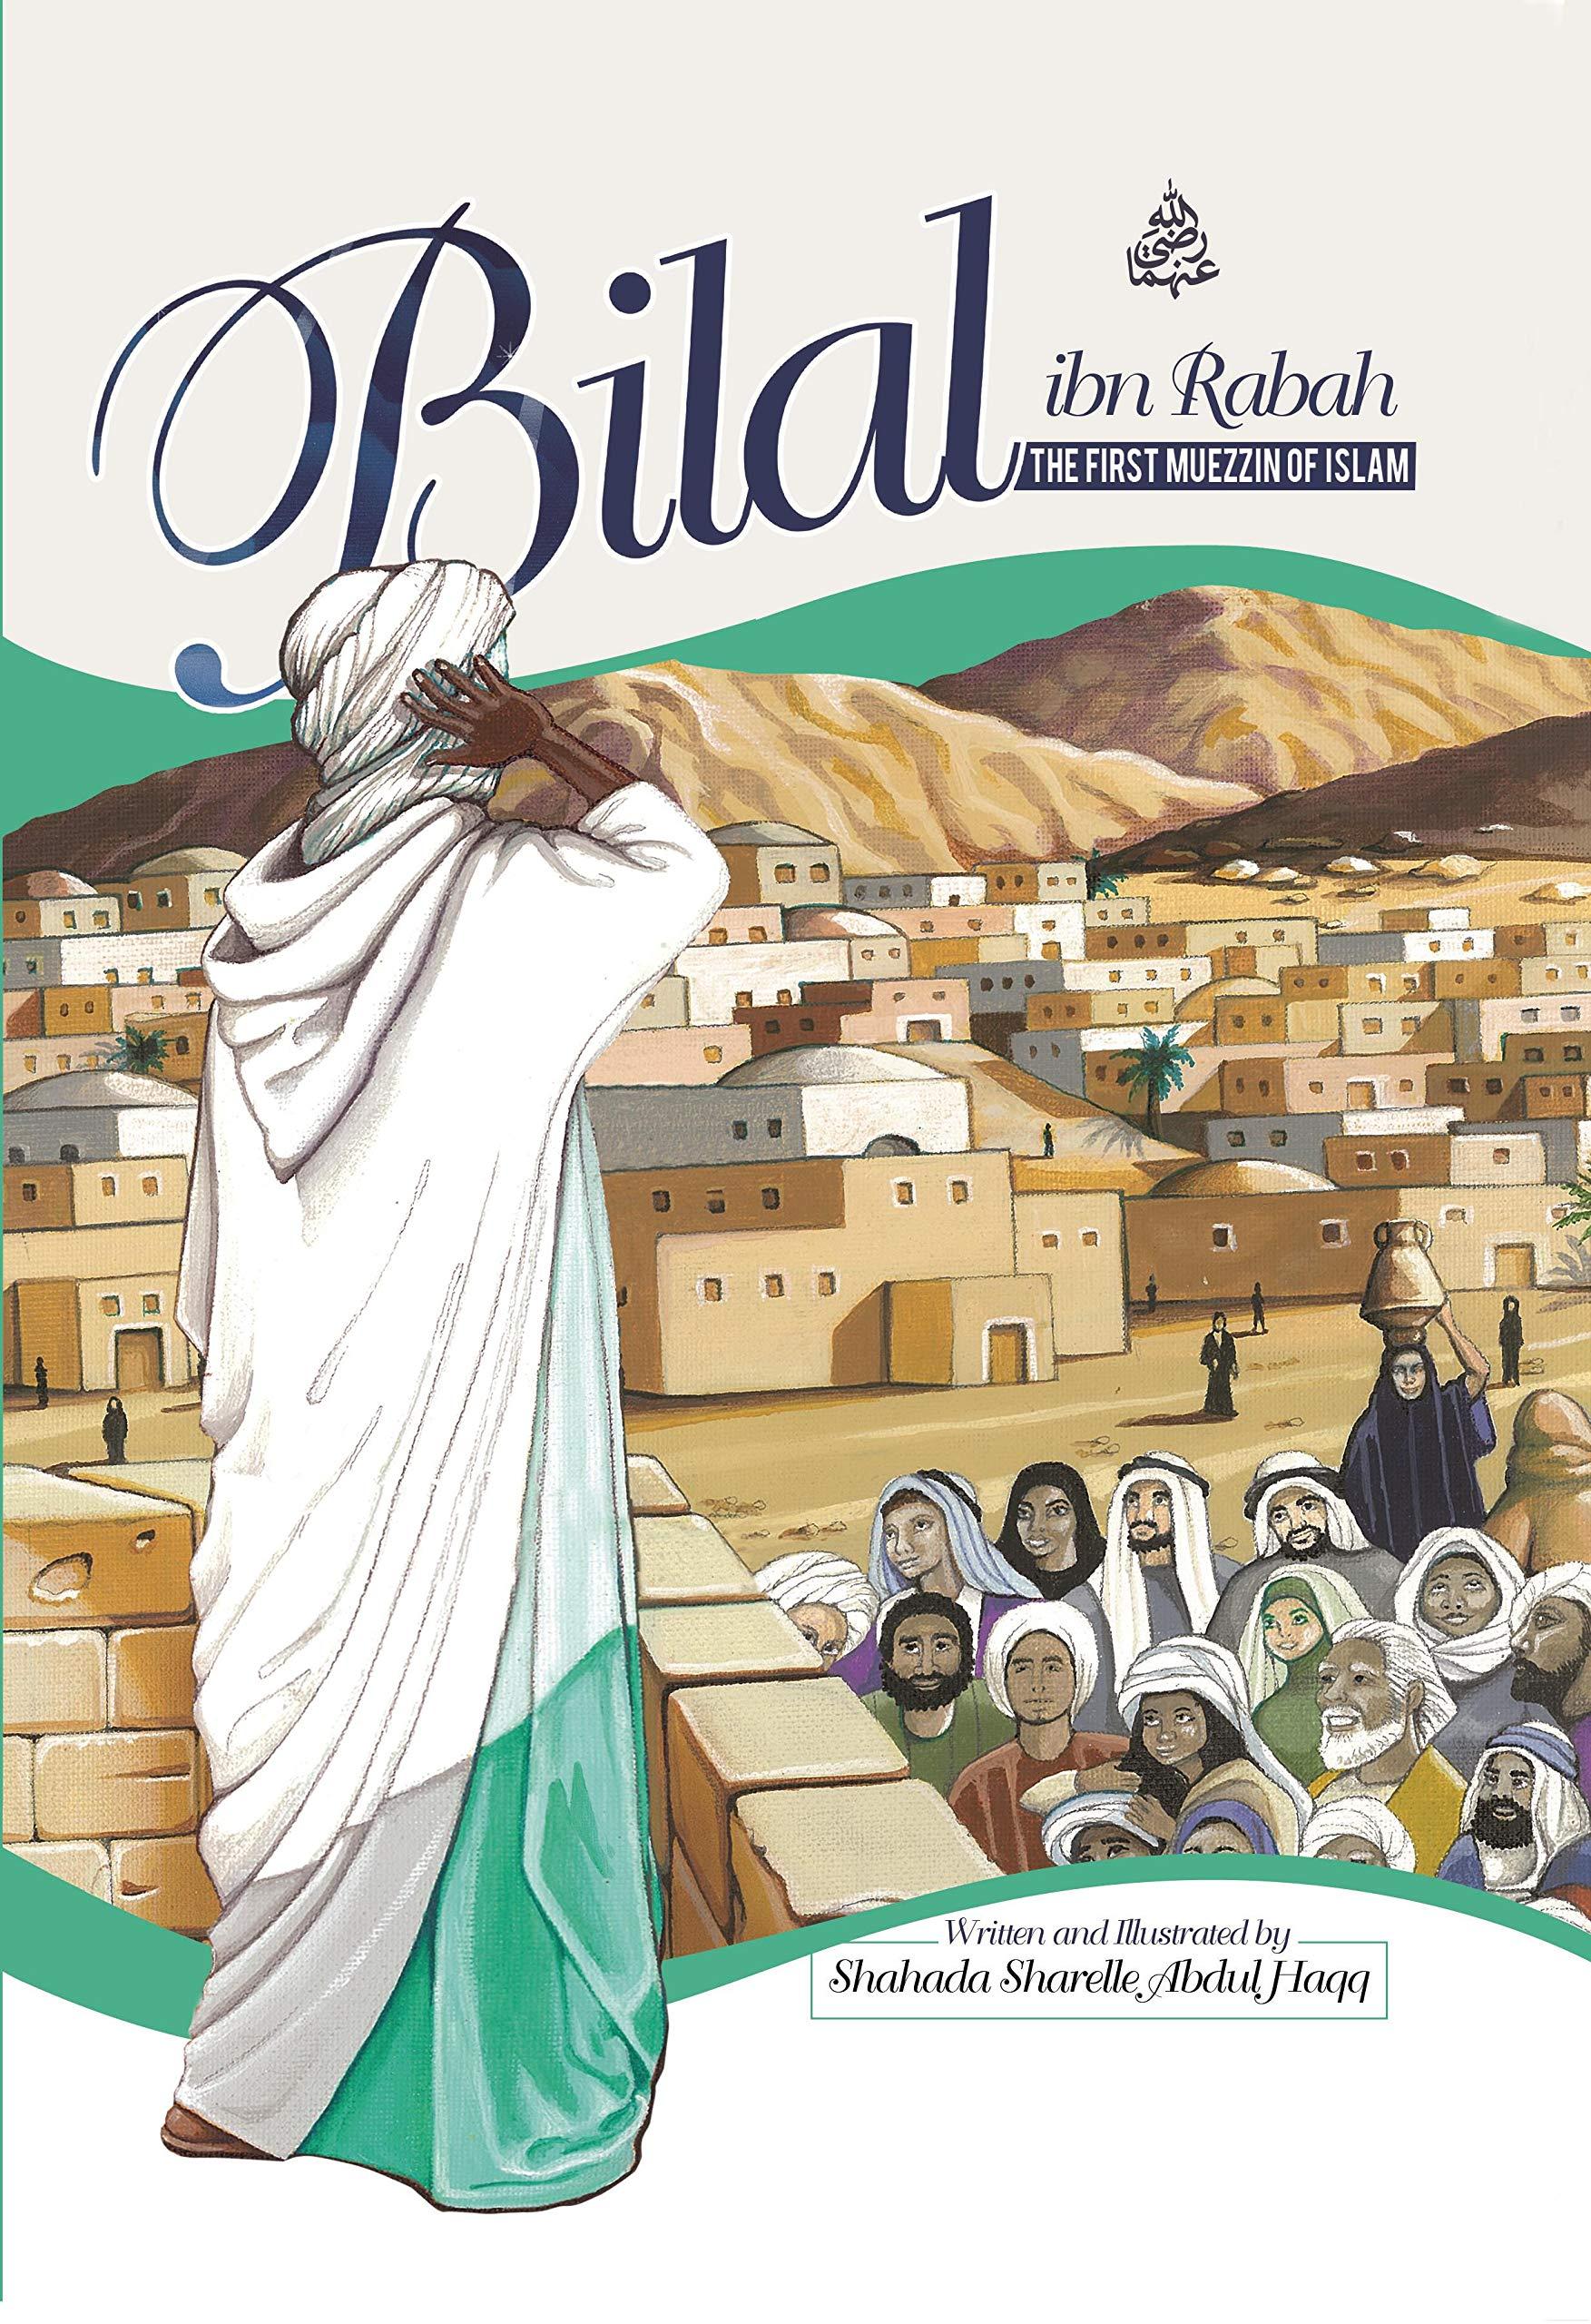 Tughra Books (June 2, 2020)